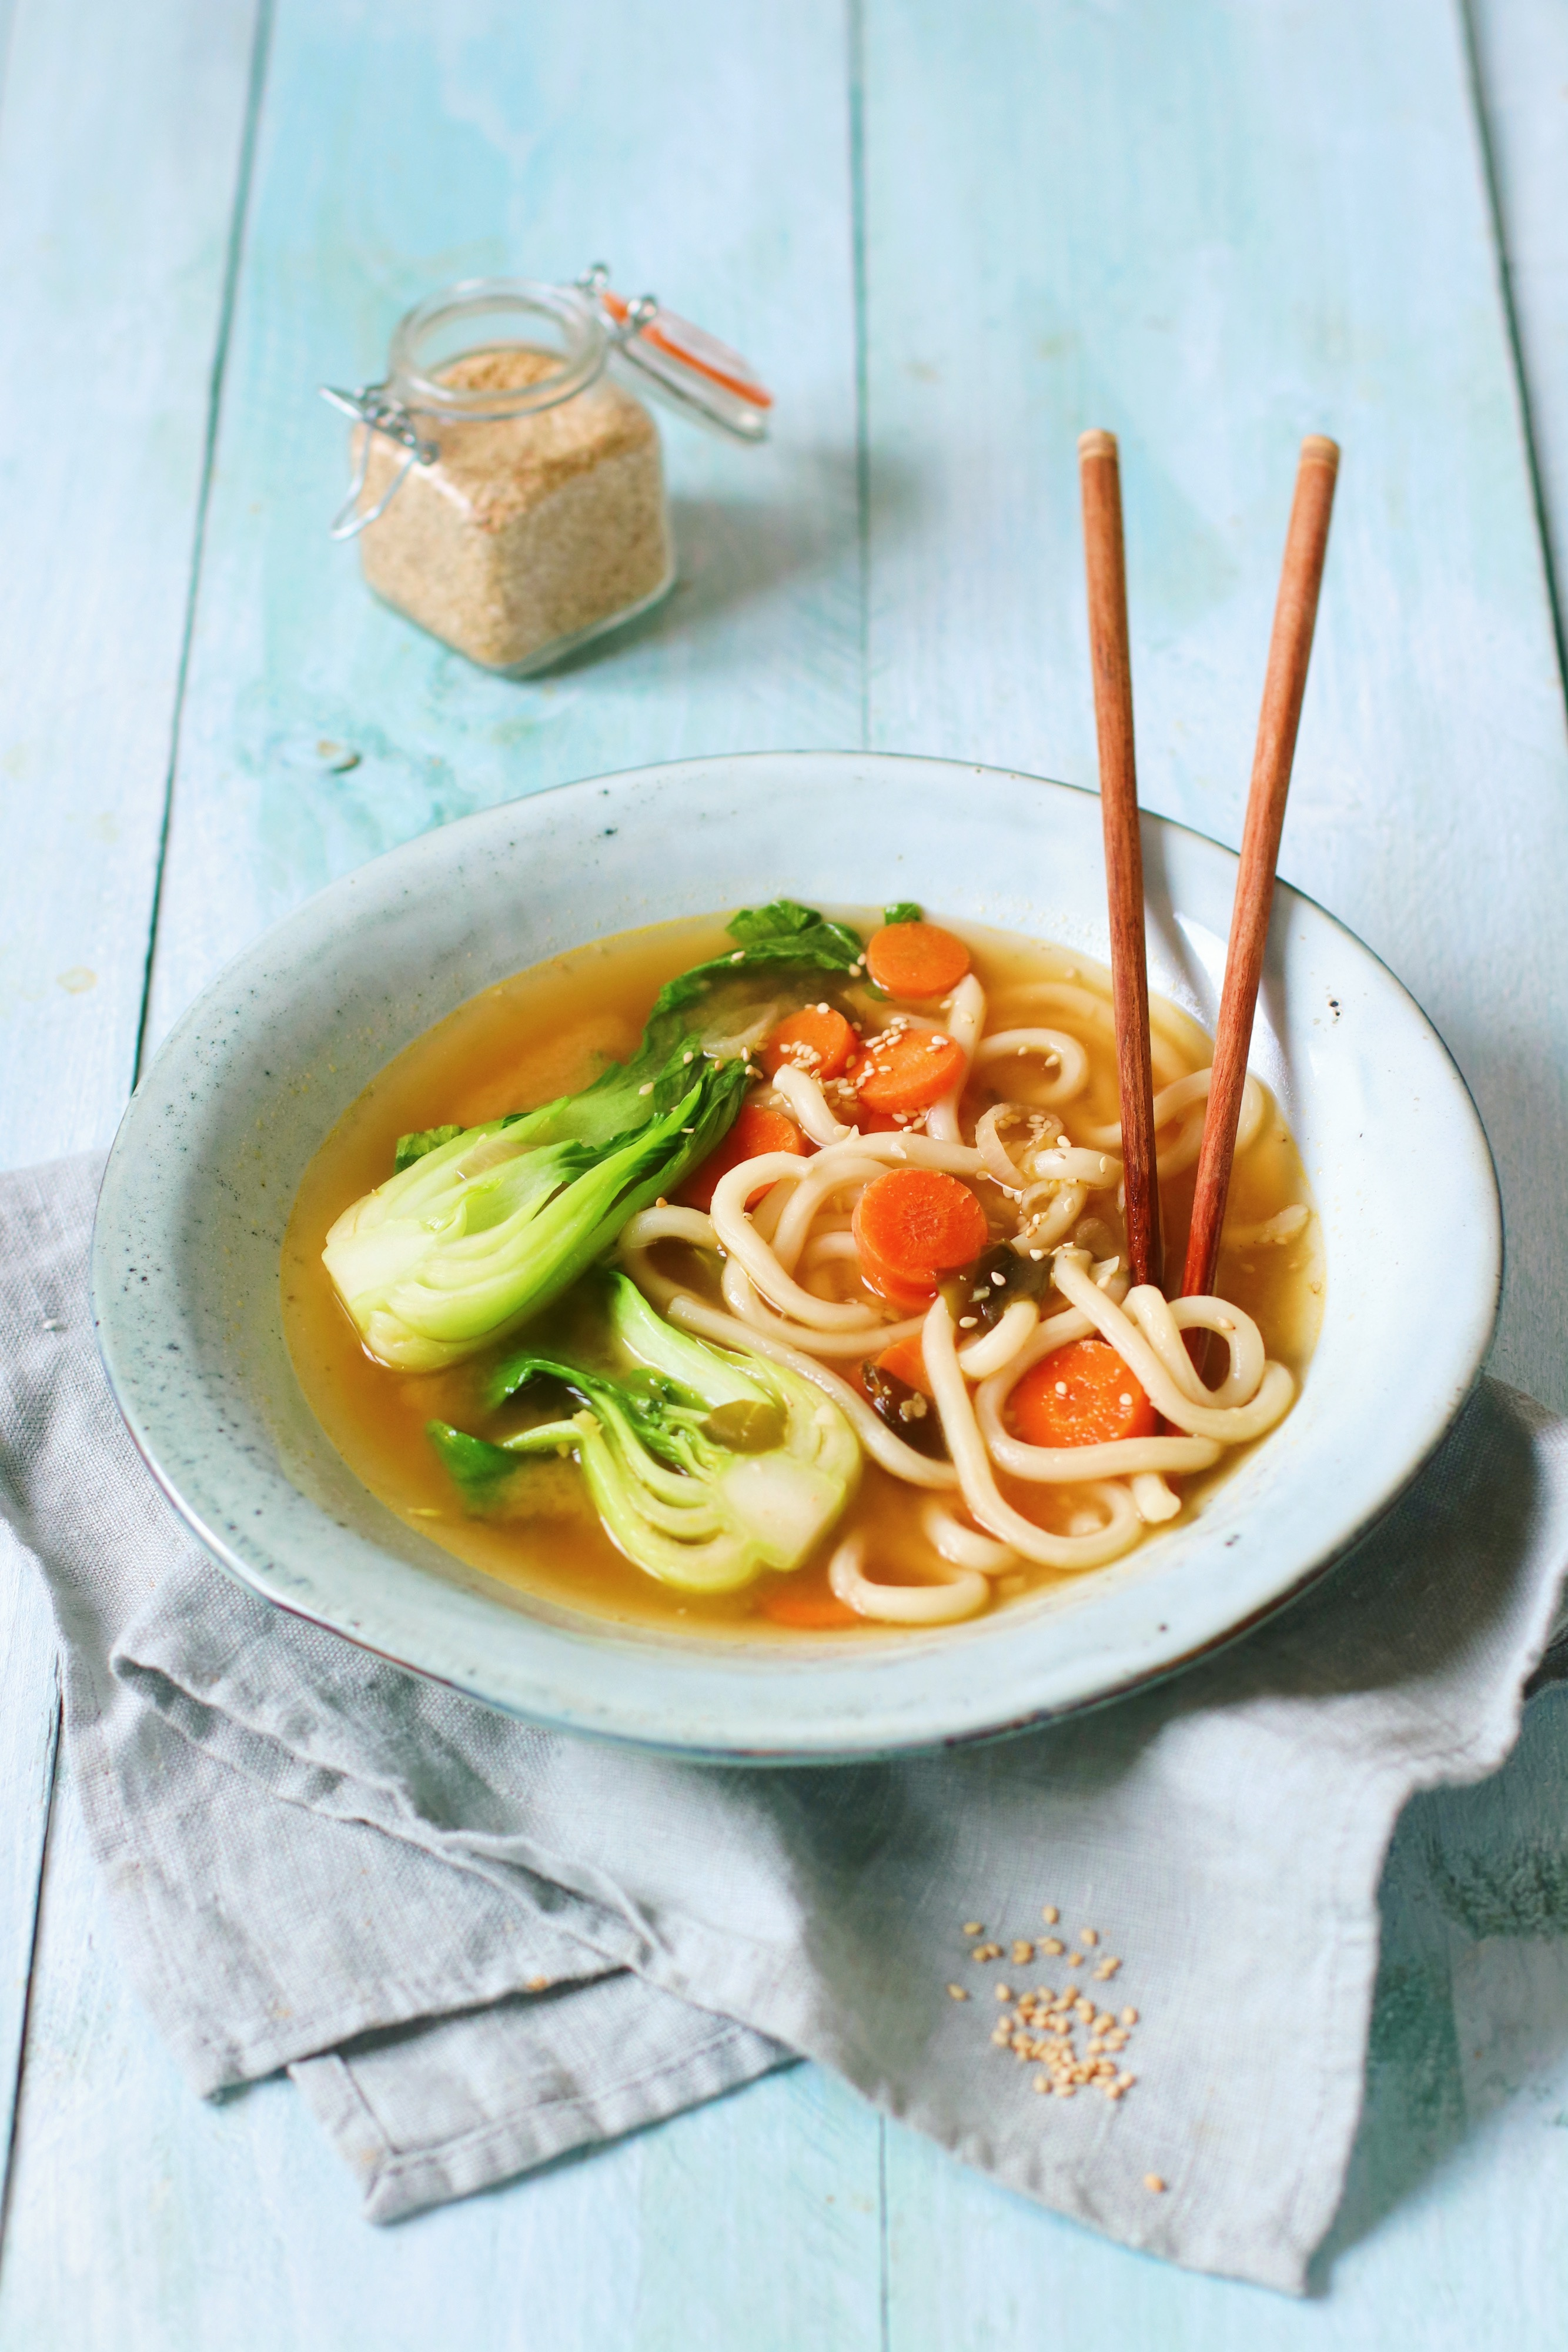 Recept udon noedel soep met bok choy www.jaimyskitchen.nl